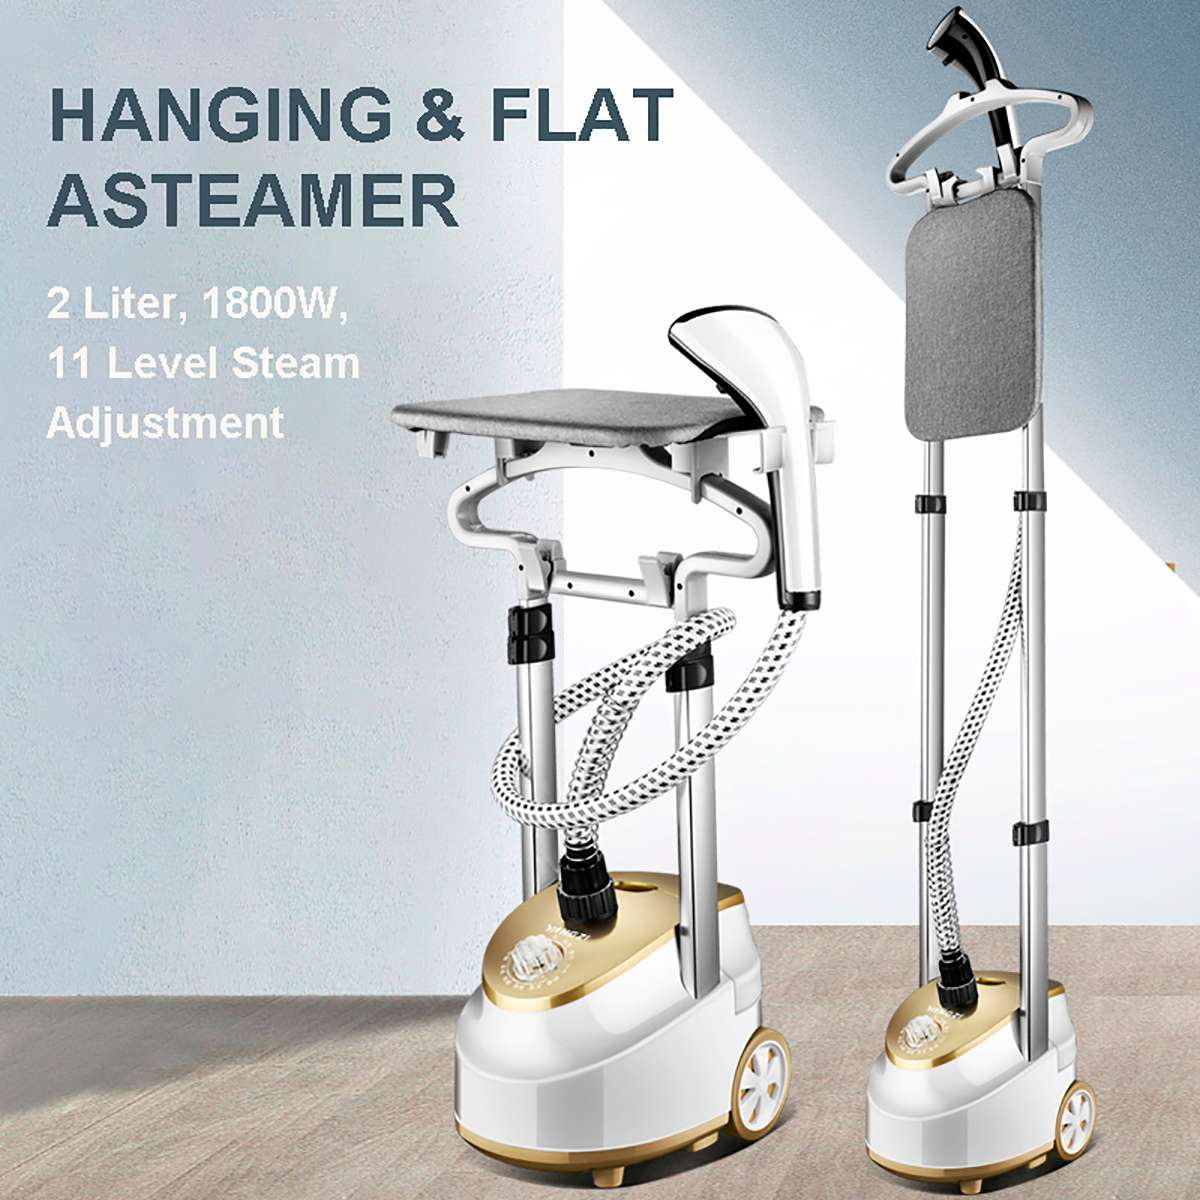 1800W Garment Steamer Household Handheld Ironing Machine 10 Gear Adjustable Vertical Flat Steam Iron Clothes Steamer